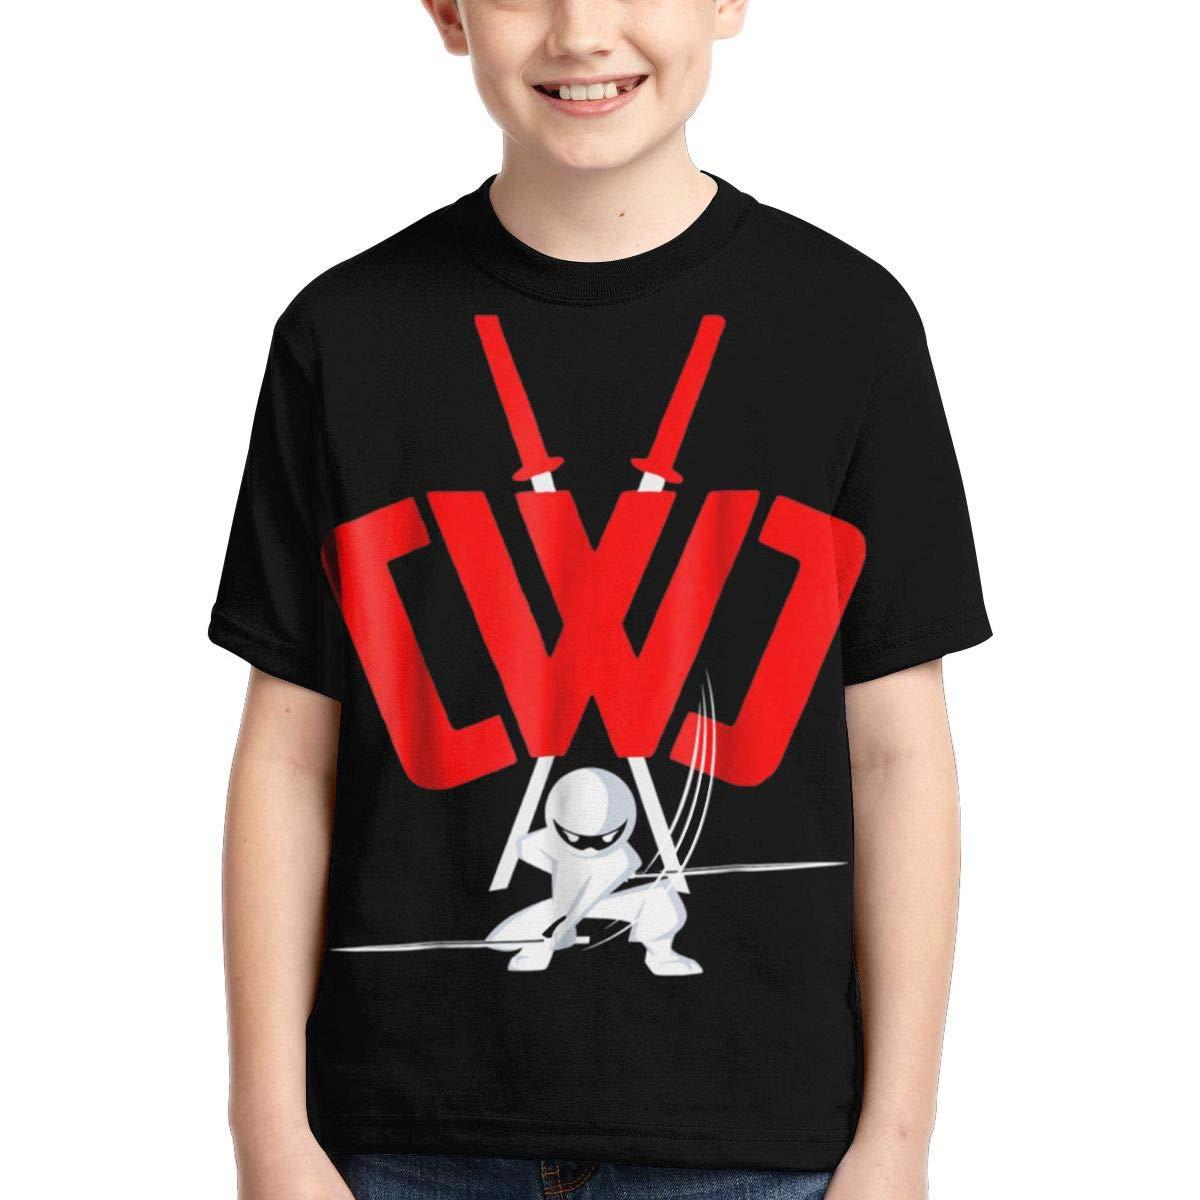 Amazon.com: Ishanqudi Chad Wild Clay YouTube T-Shirt for ...